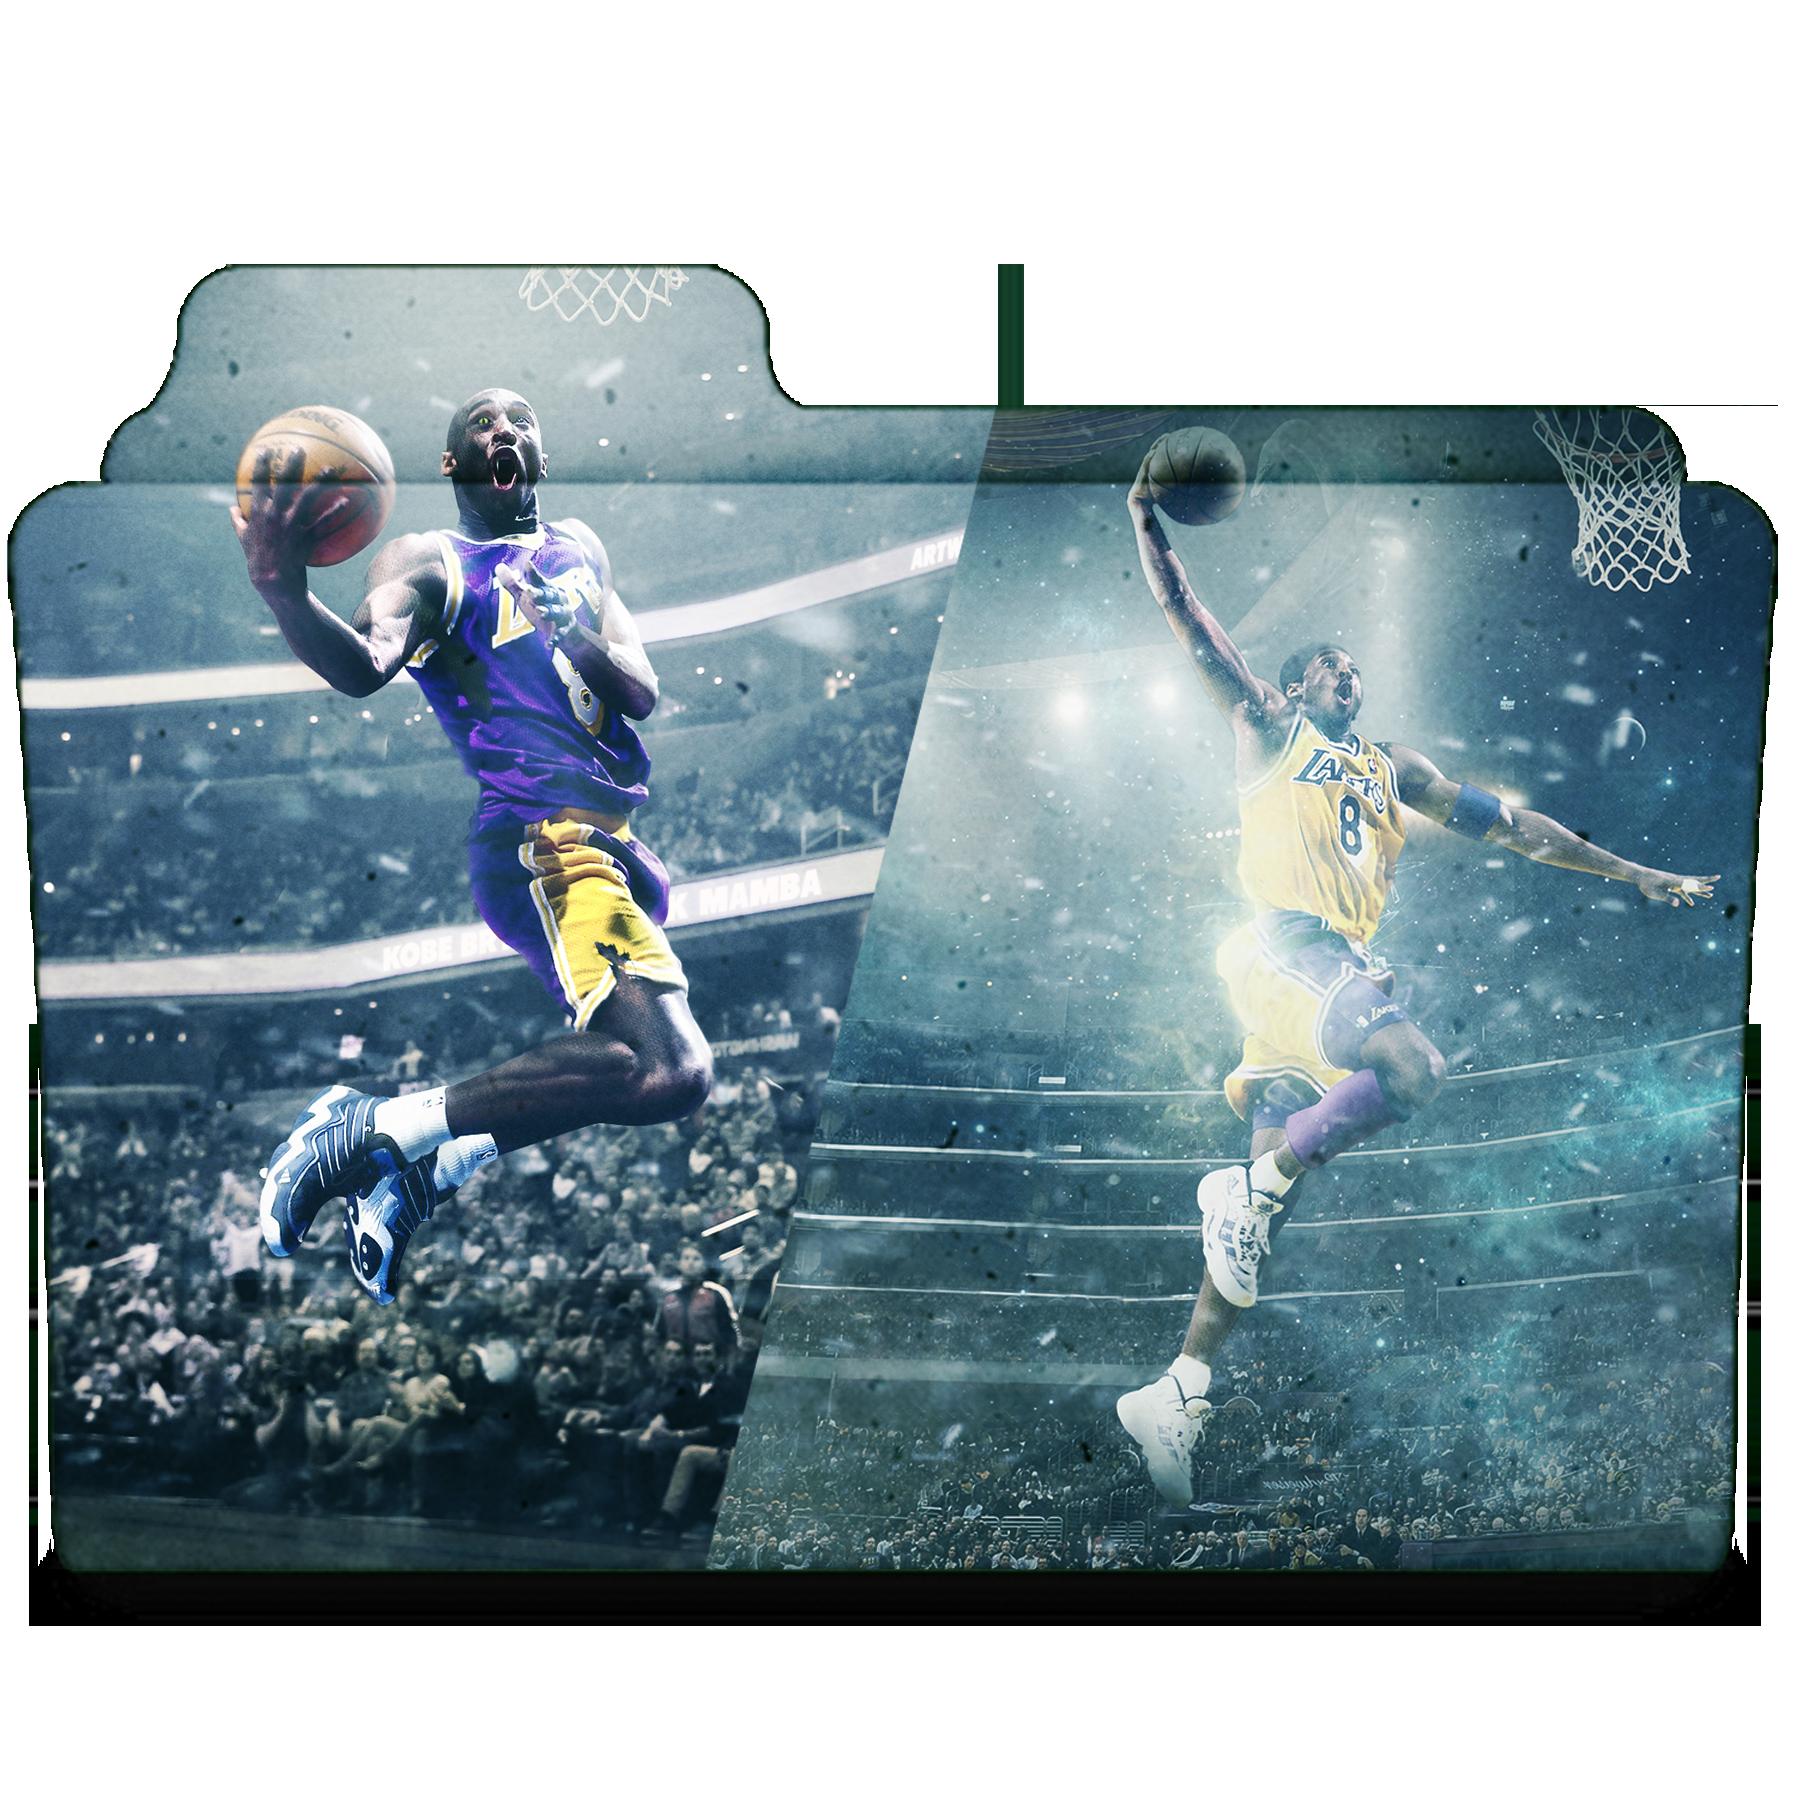 6618f0d04ce3 Kobe Bryant .PSD Pack — Sanoian Designs